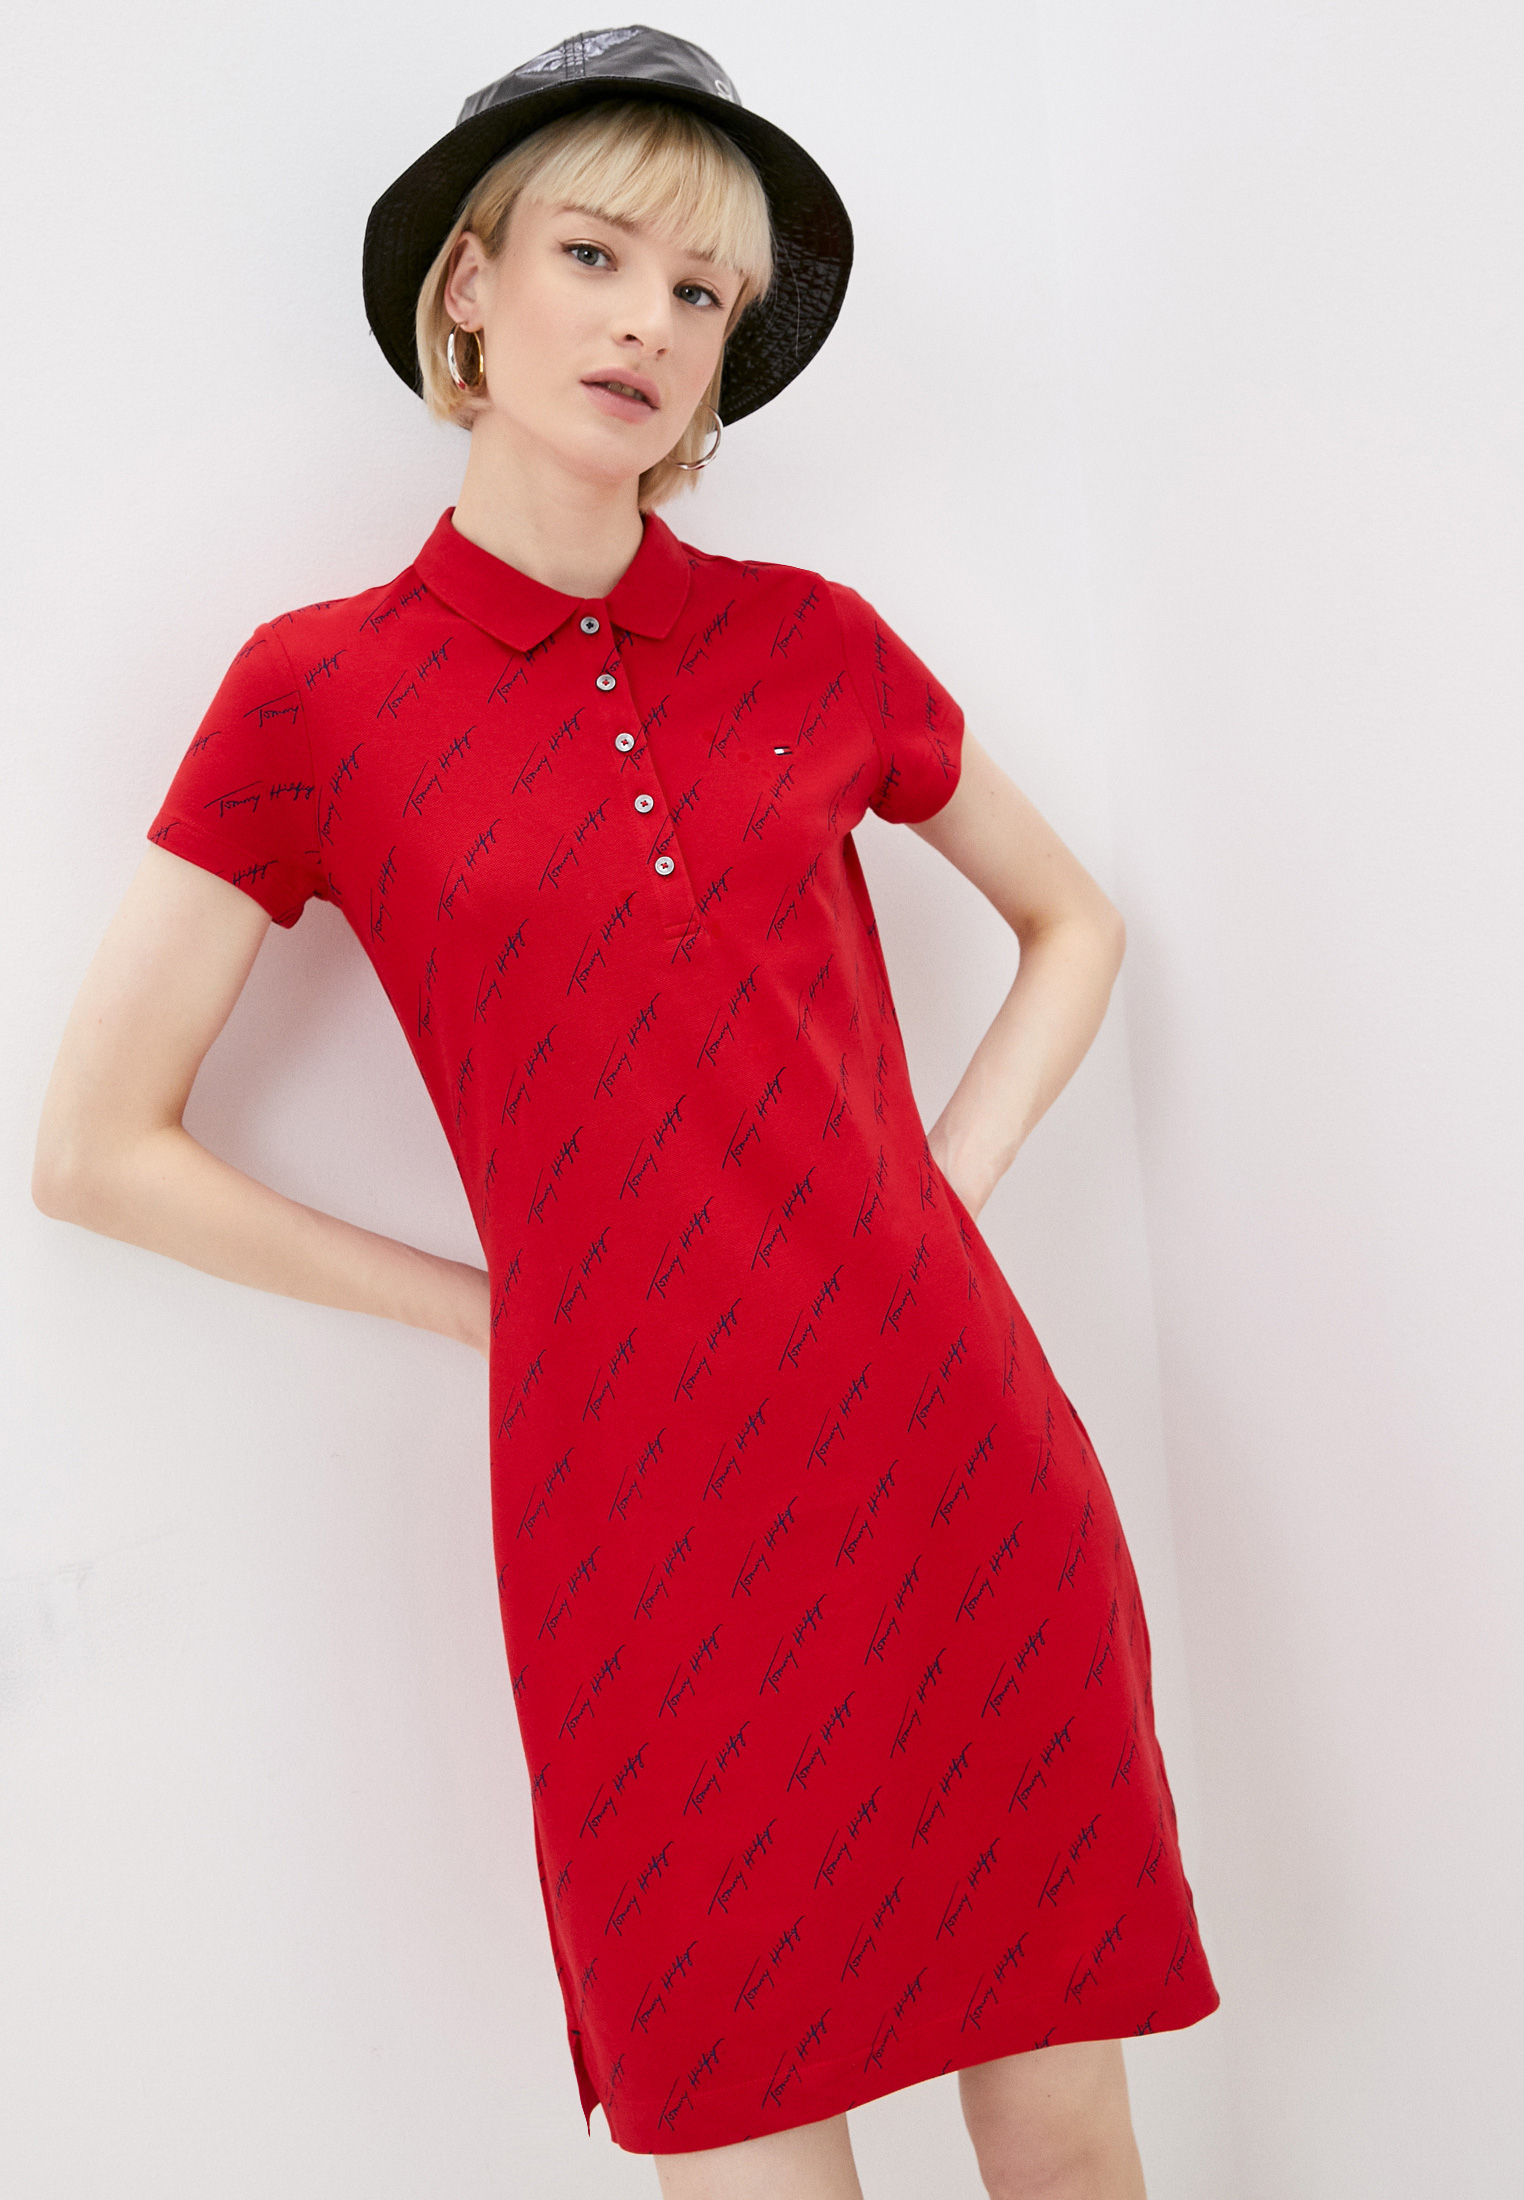 Платье Tommy Hilfiger (Томми Хилфигер) WW0WW26193: изображение 1